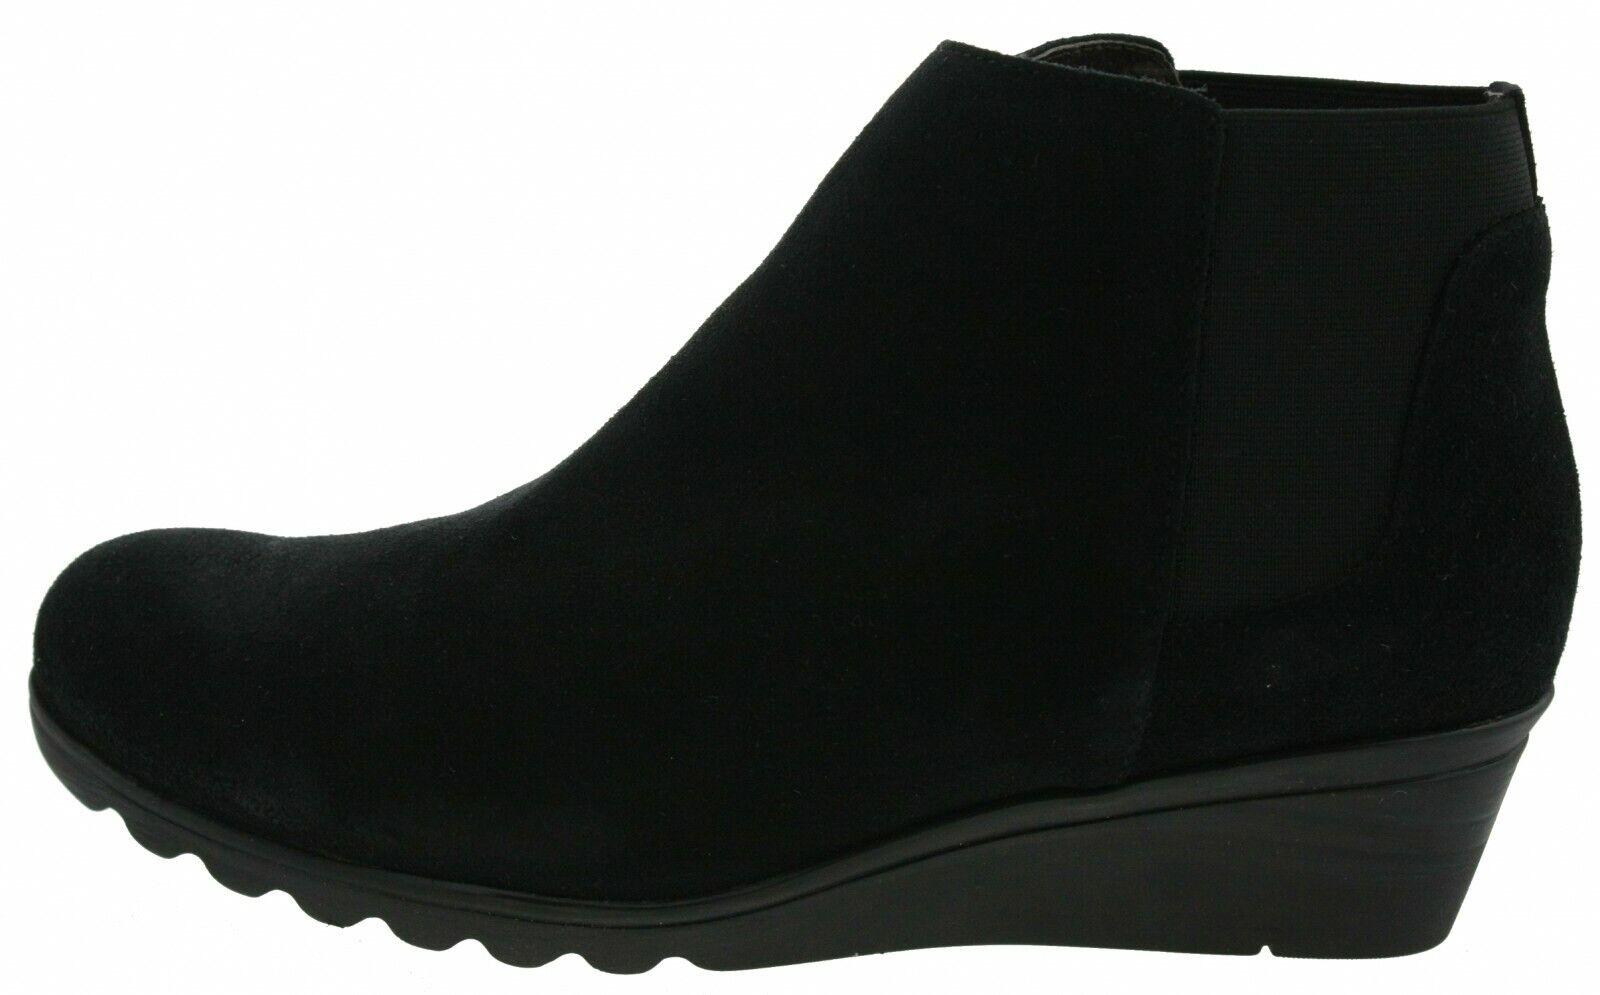 501916-1594 Liberitae 21503312 Keilabsatz Ankleboots Wildleder black EUR 41